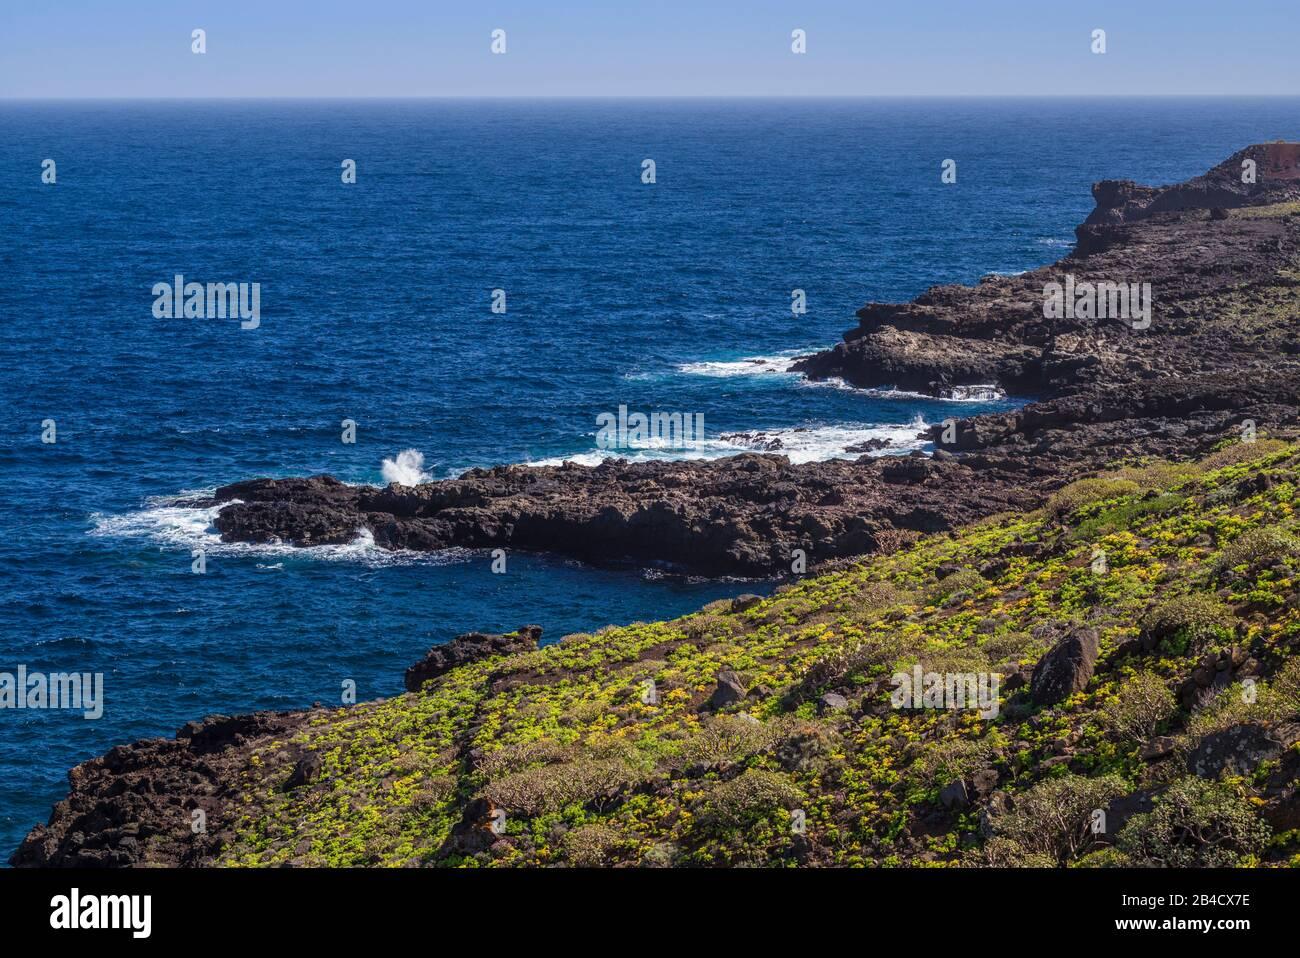 Spain, Canary Islands, El Hierro Island, Tamaduste, coastline Stock Photo